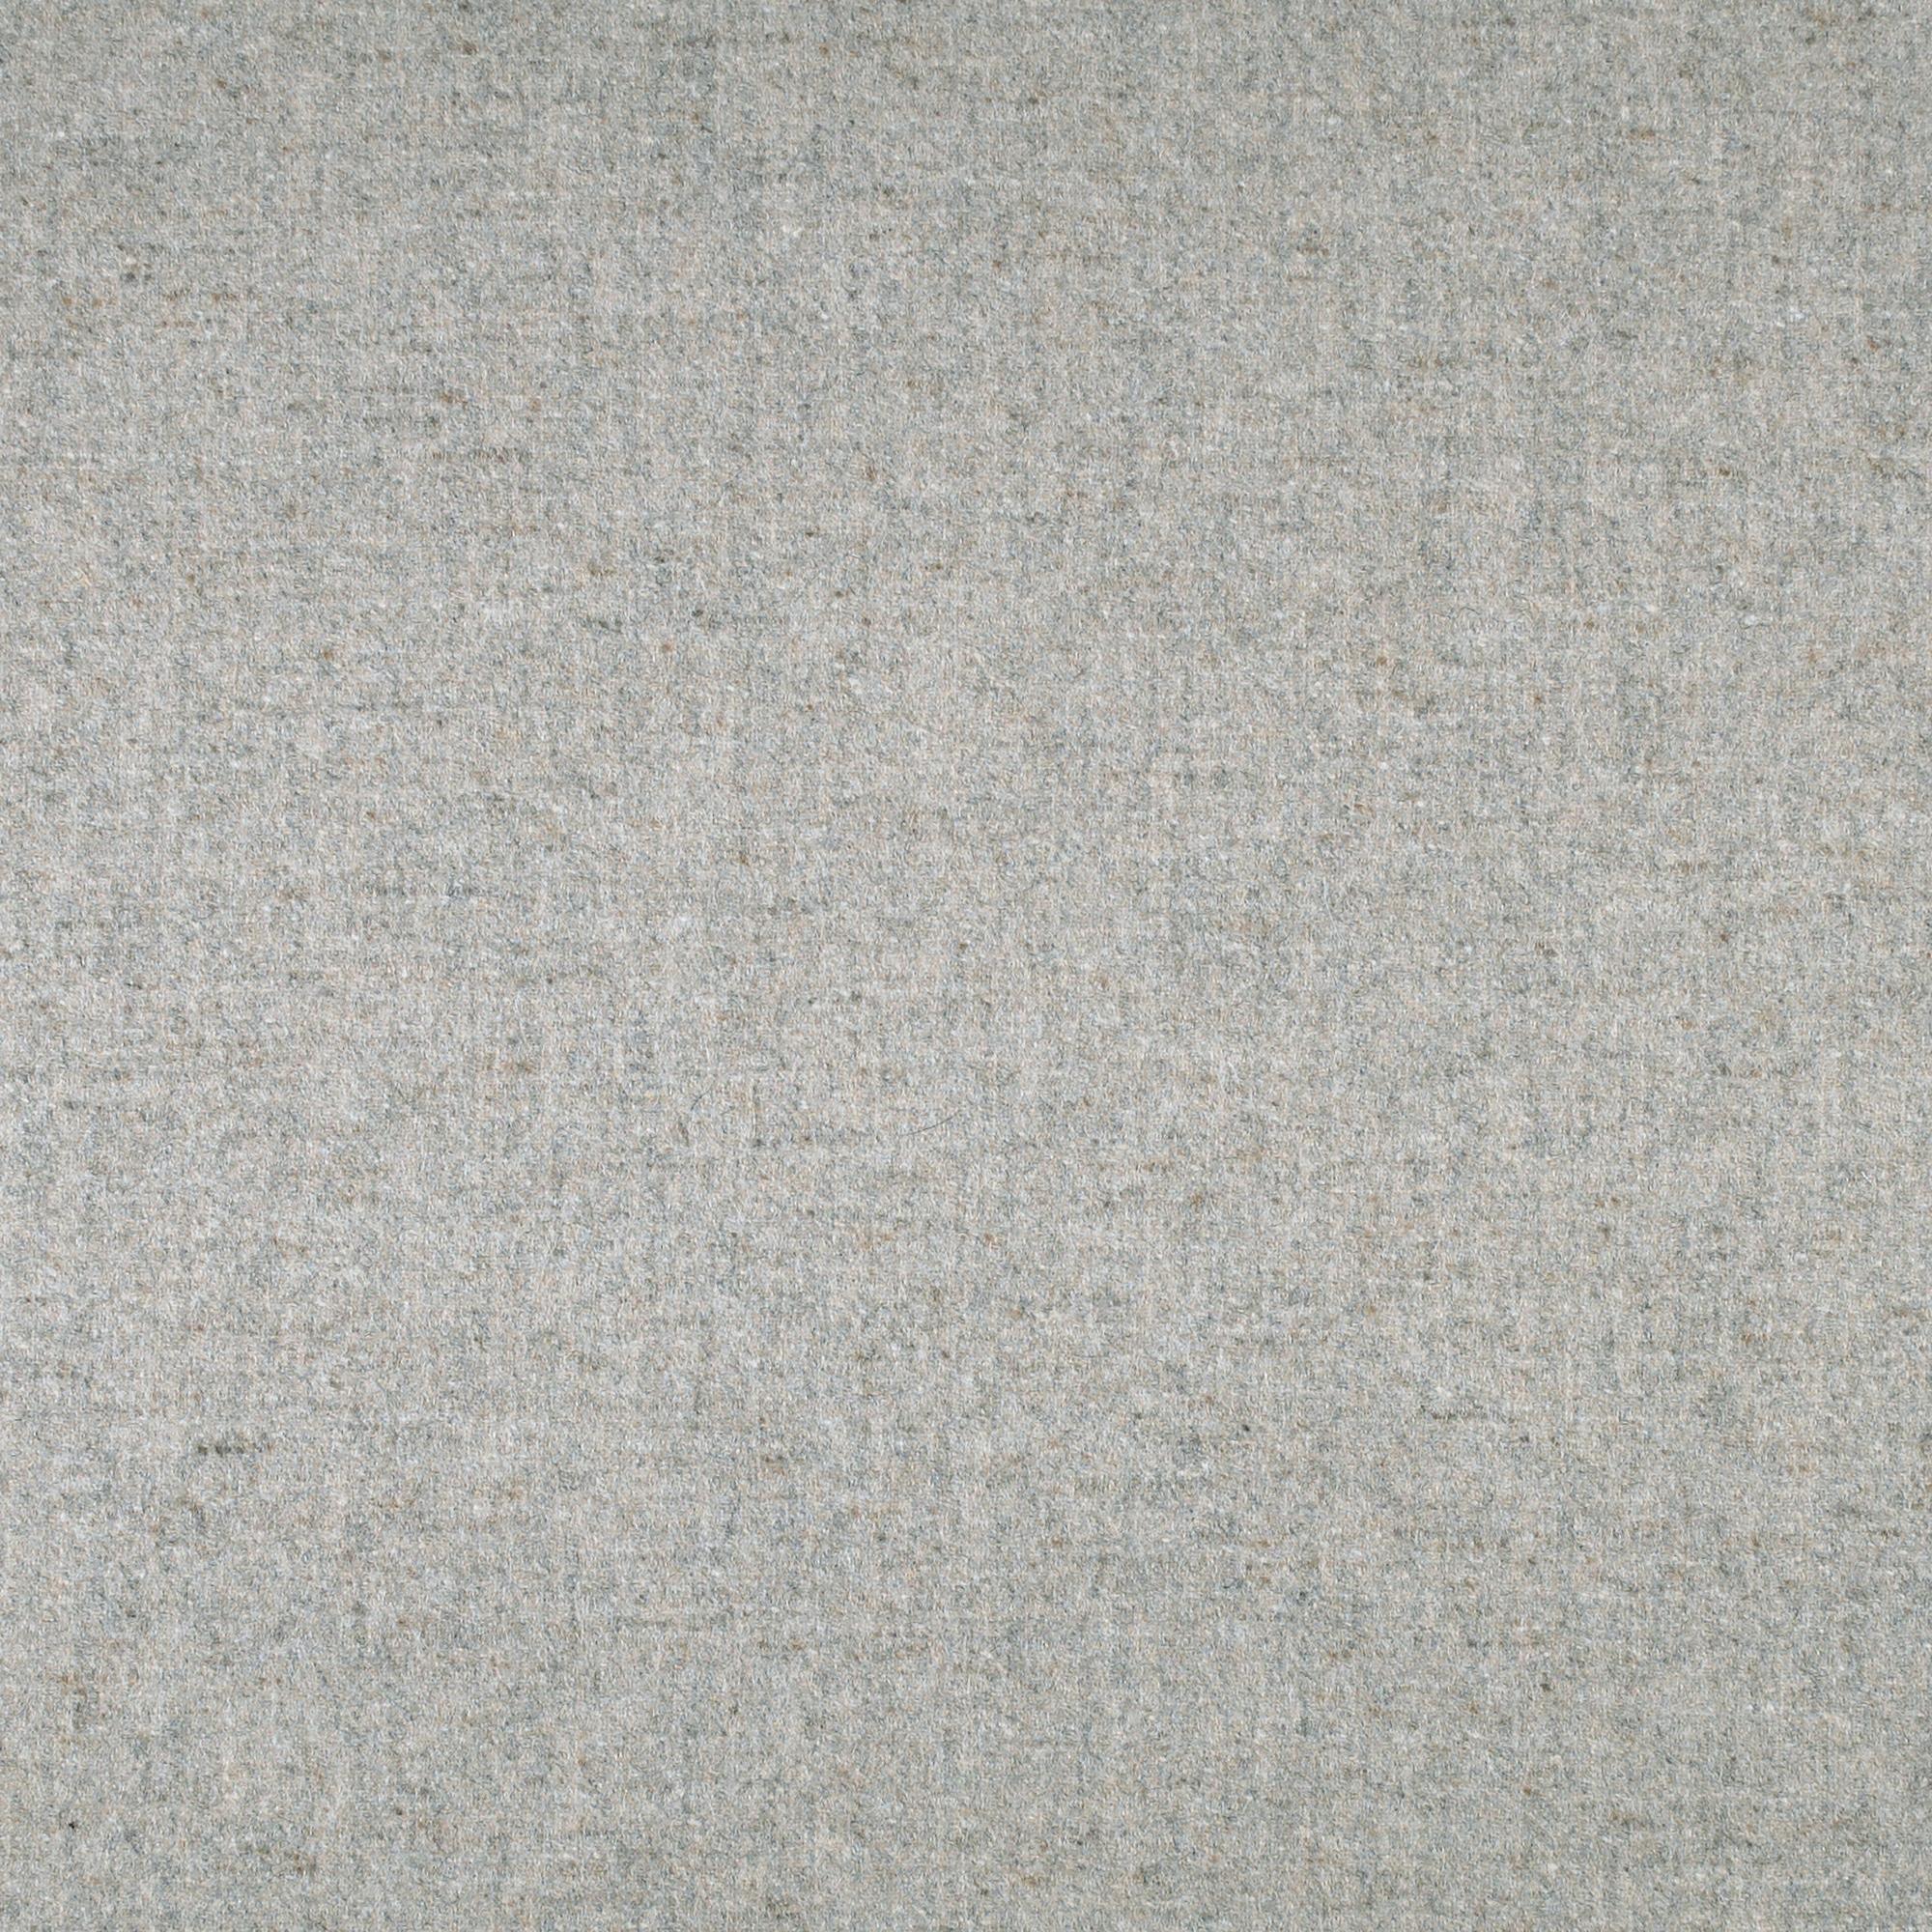 Per Meter Abraham Moon Deepdale Ivory 100/% Wool Upholstery Fabric